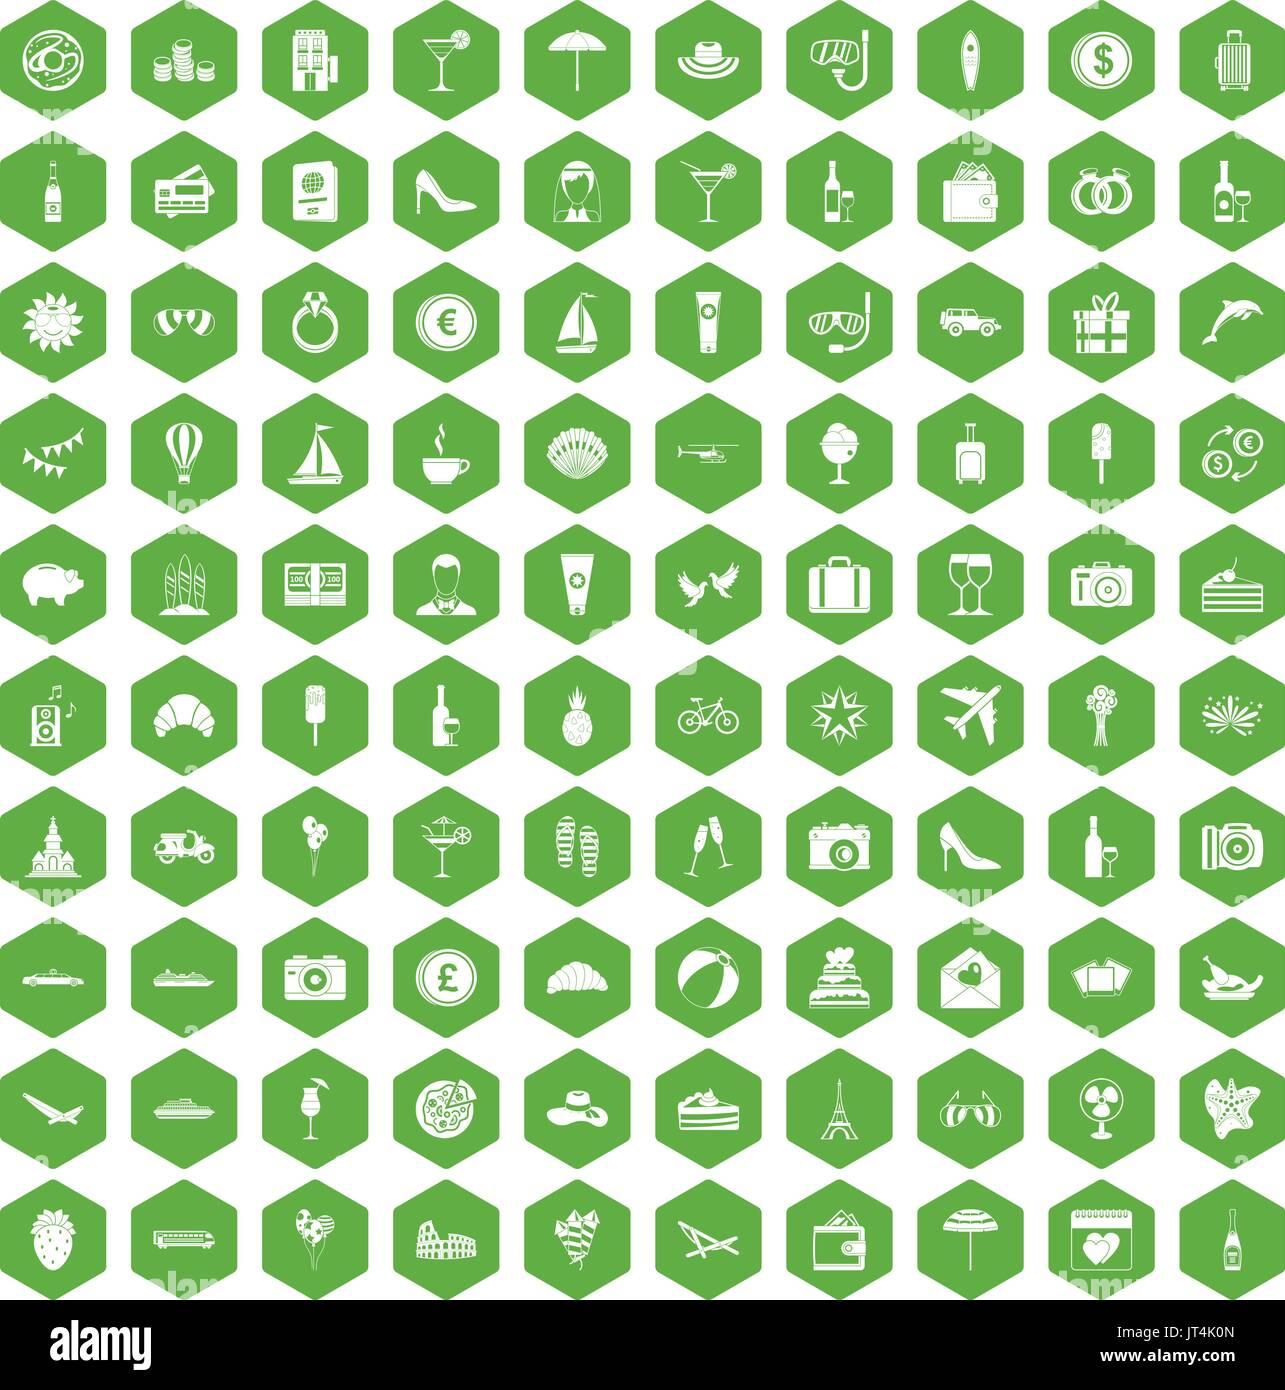 100 icônes de miel vert hexagonal Illustration de Vecteur